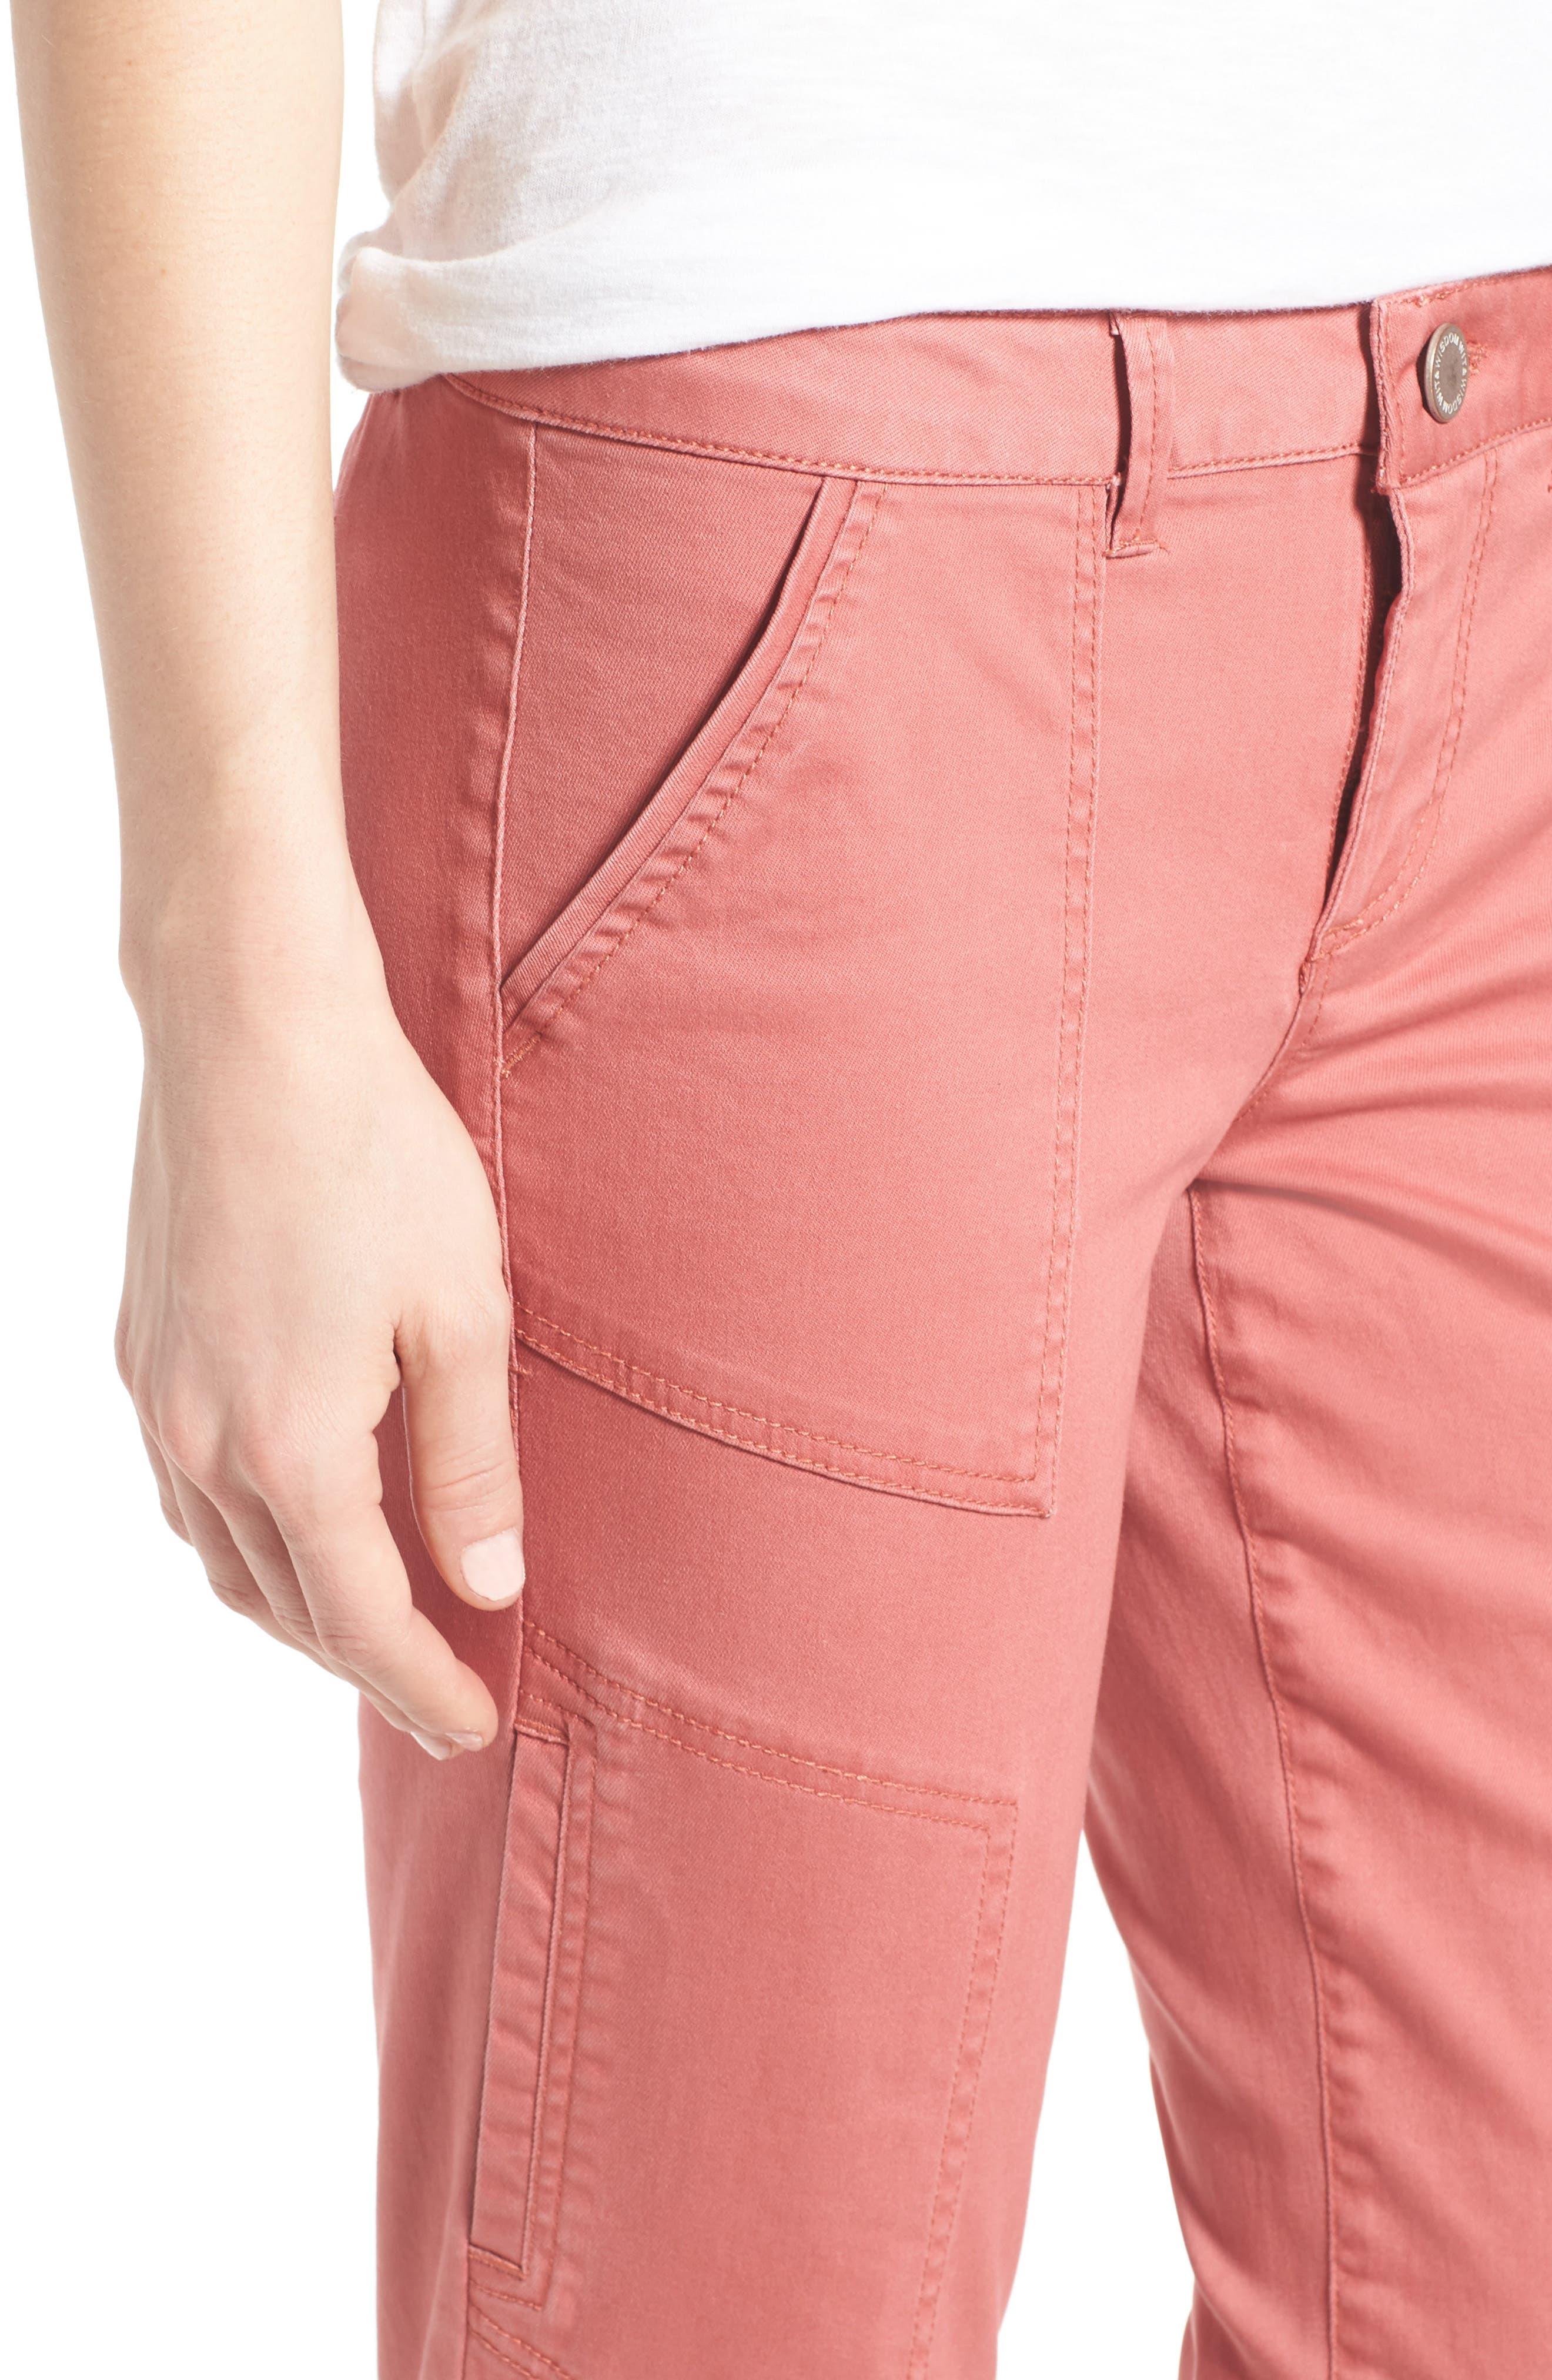 Skinny Cargo Pants,                             Alternate thumbnail 56, color,